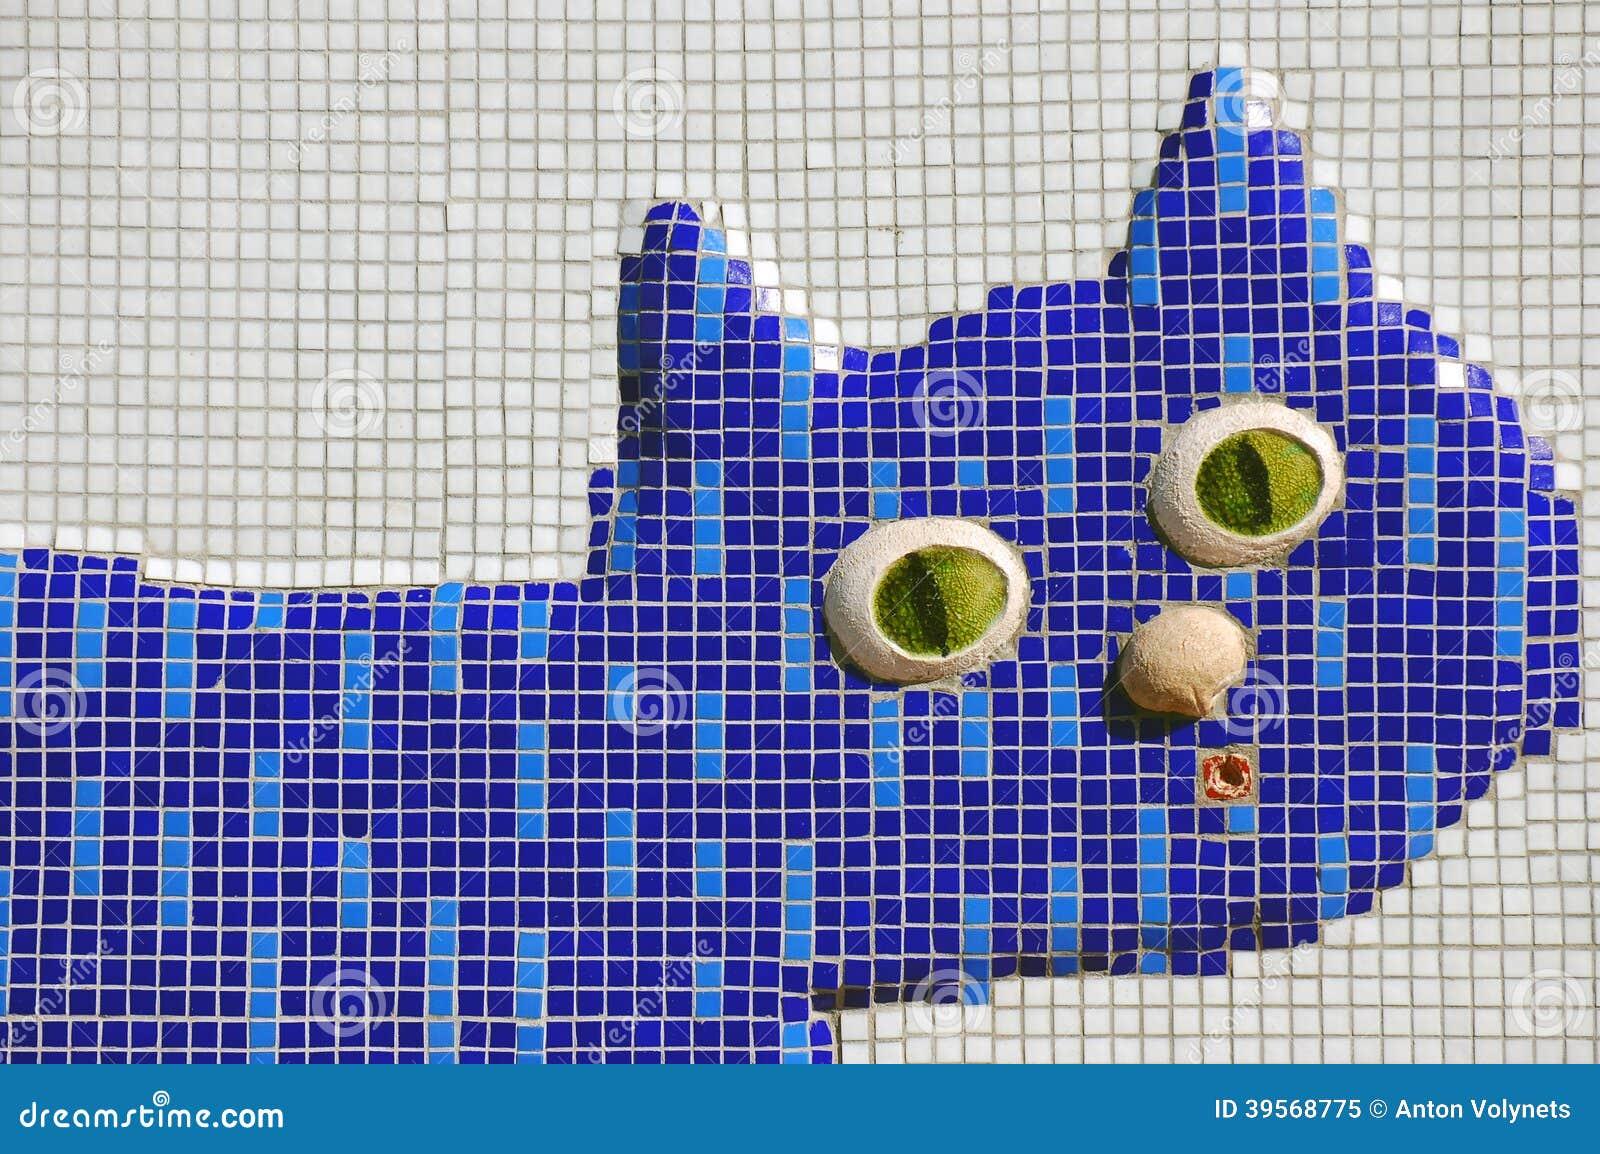 Teal Blue Mosaic Cat Chenille